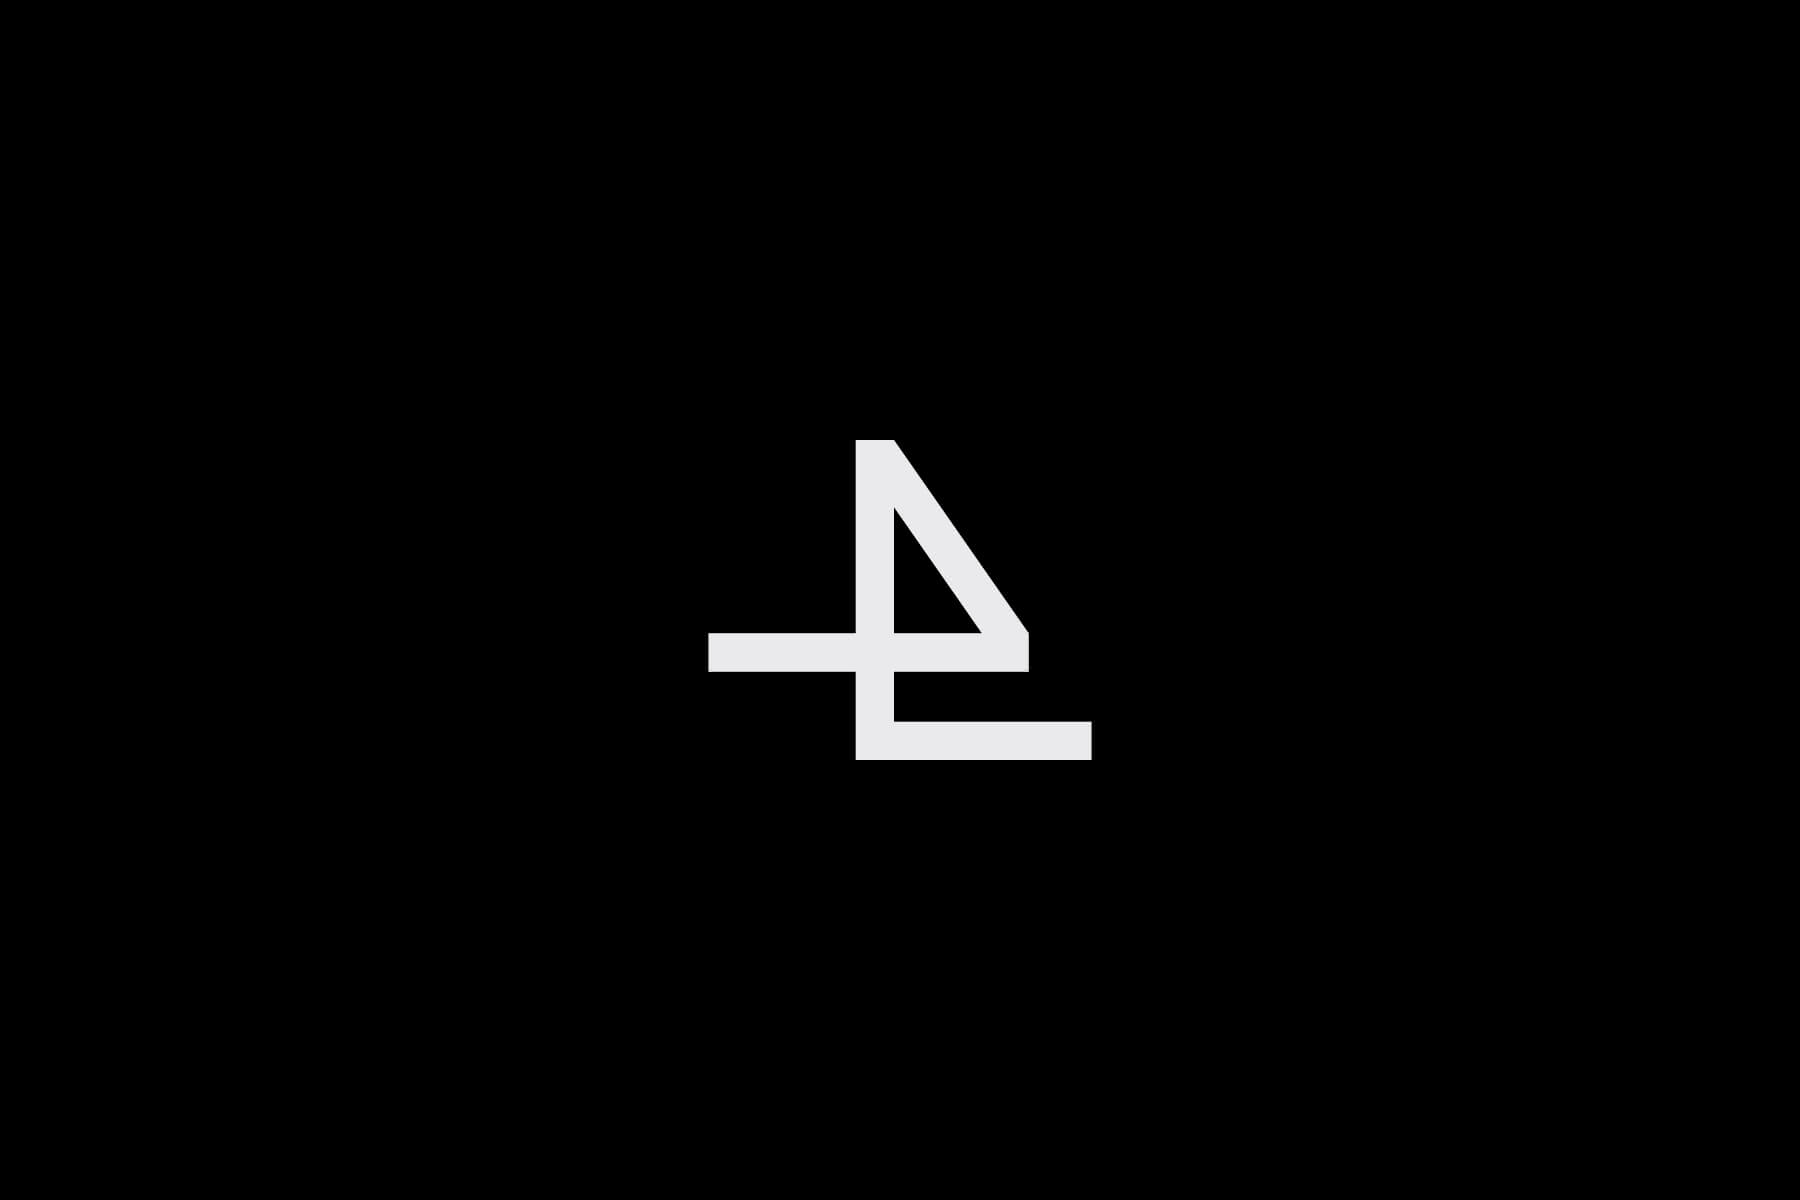 grafikdesign-janis-weidner-lindau-bodensee-logo-03